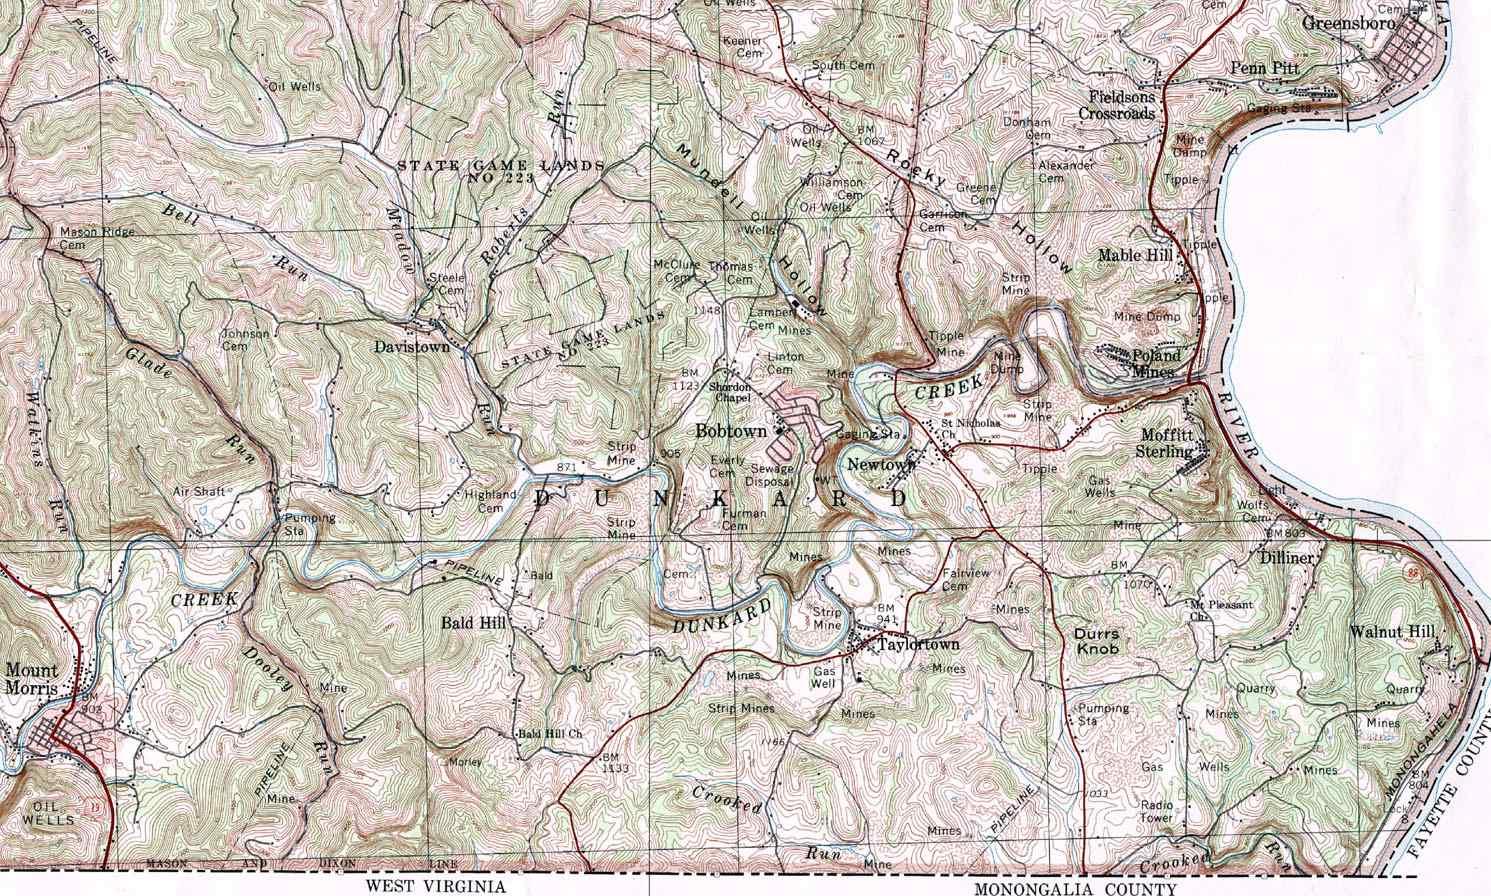 Greene County Pagenweb Maps